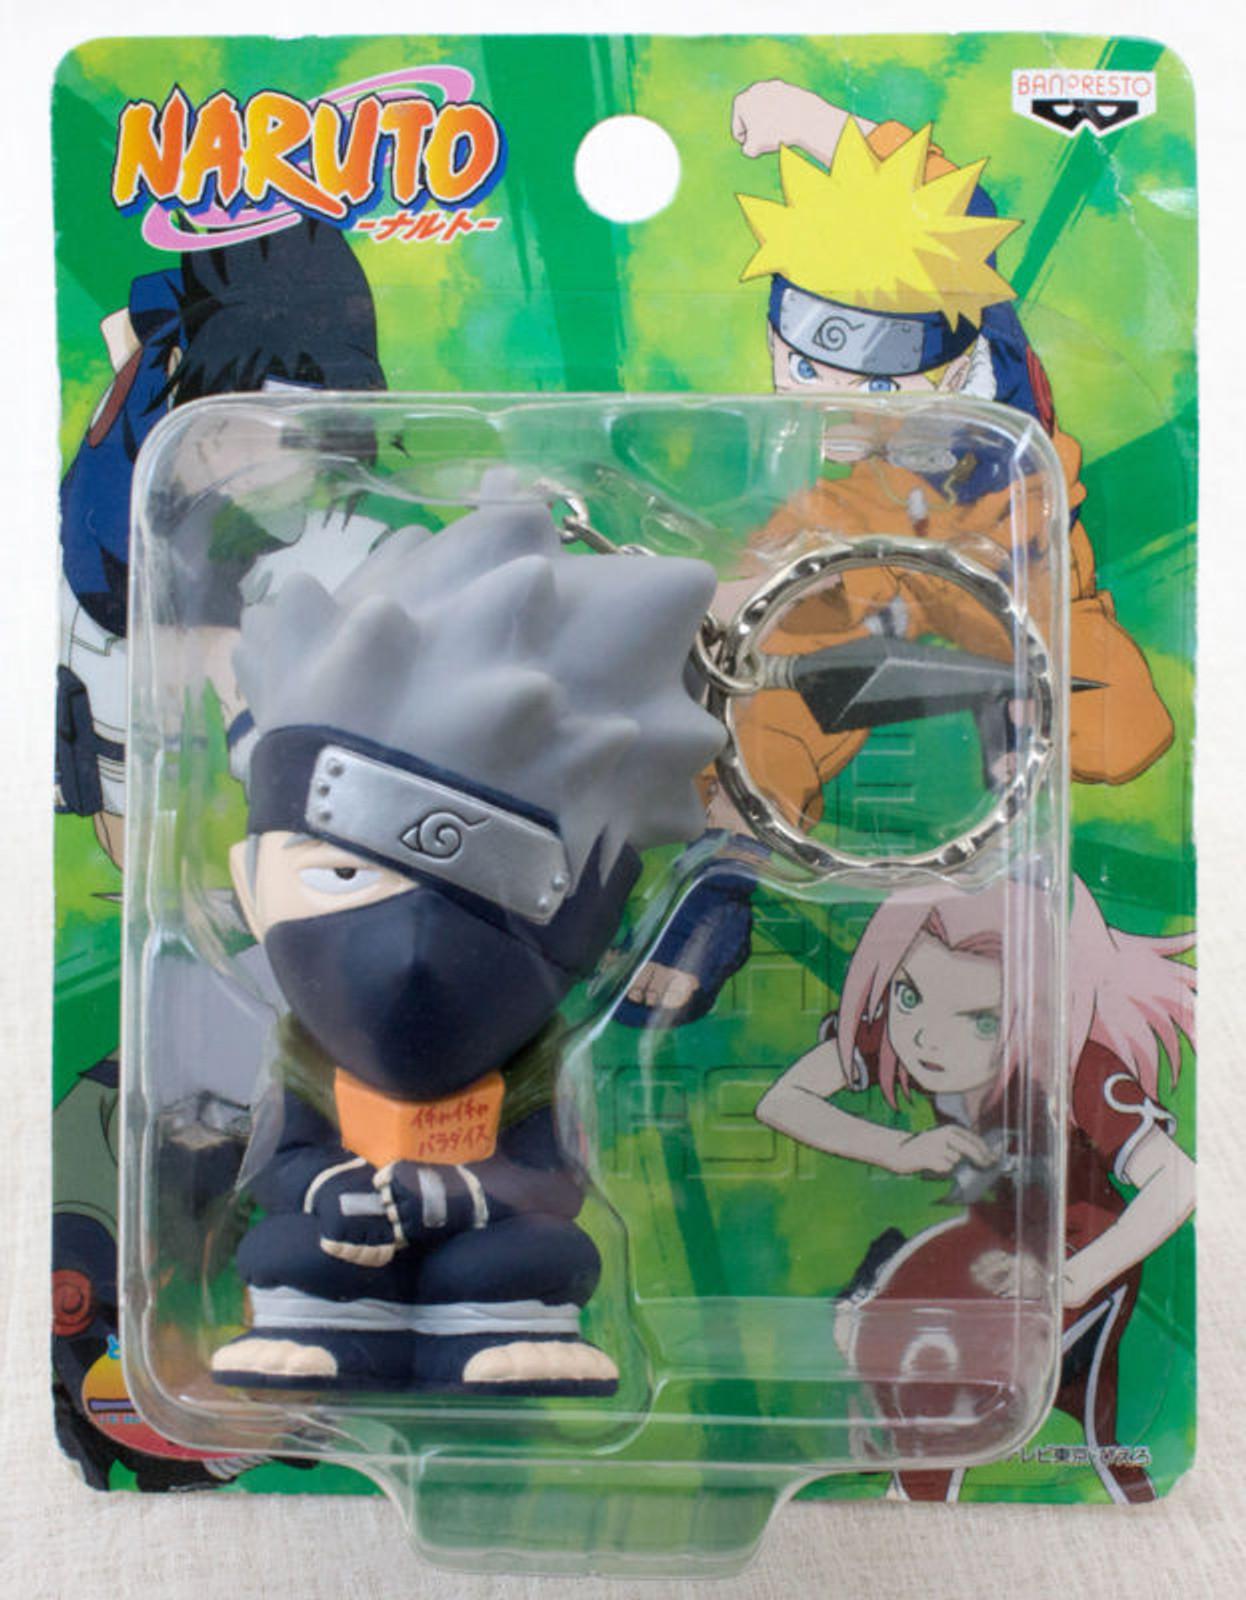 RARE NARUTO Kakashi Hatake Mascot FIgure Key Chain Holder JAPAN ANIME